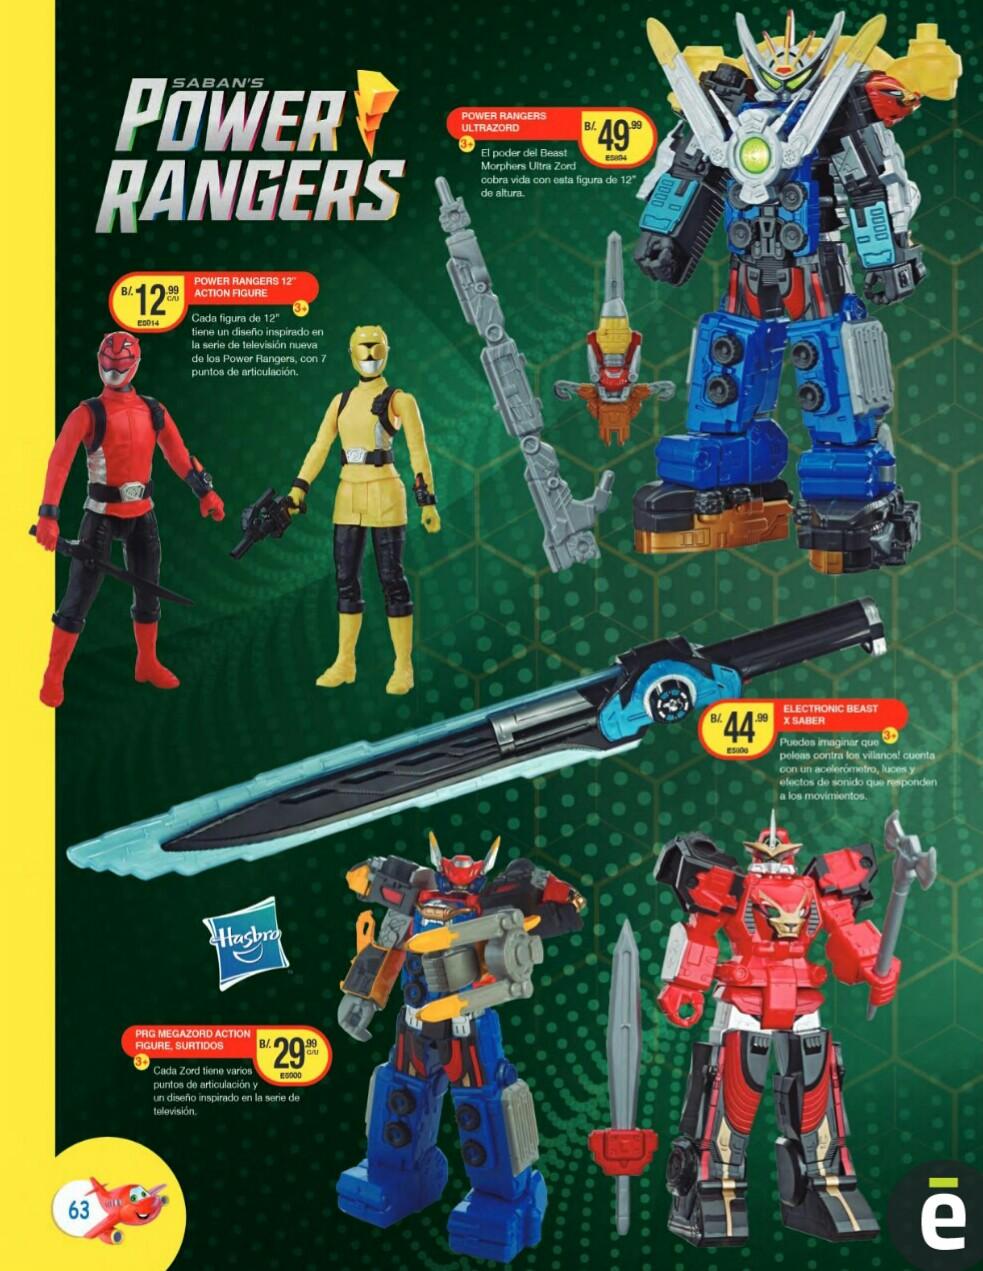 Catalogo juguetes Titan Toys 2019 p63